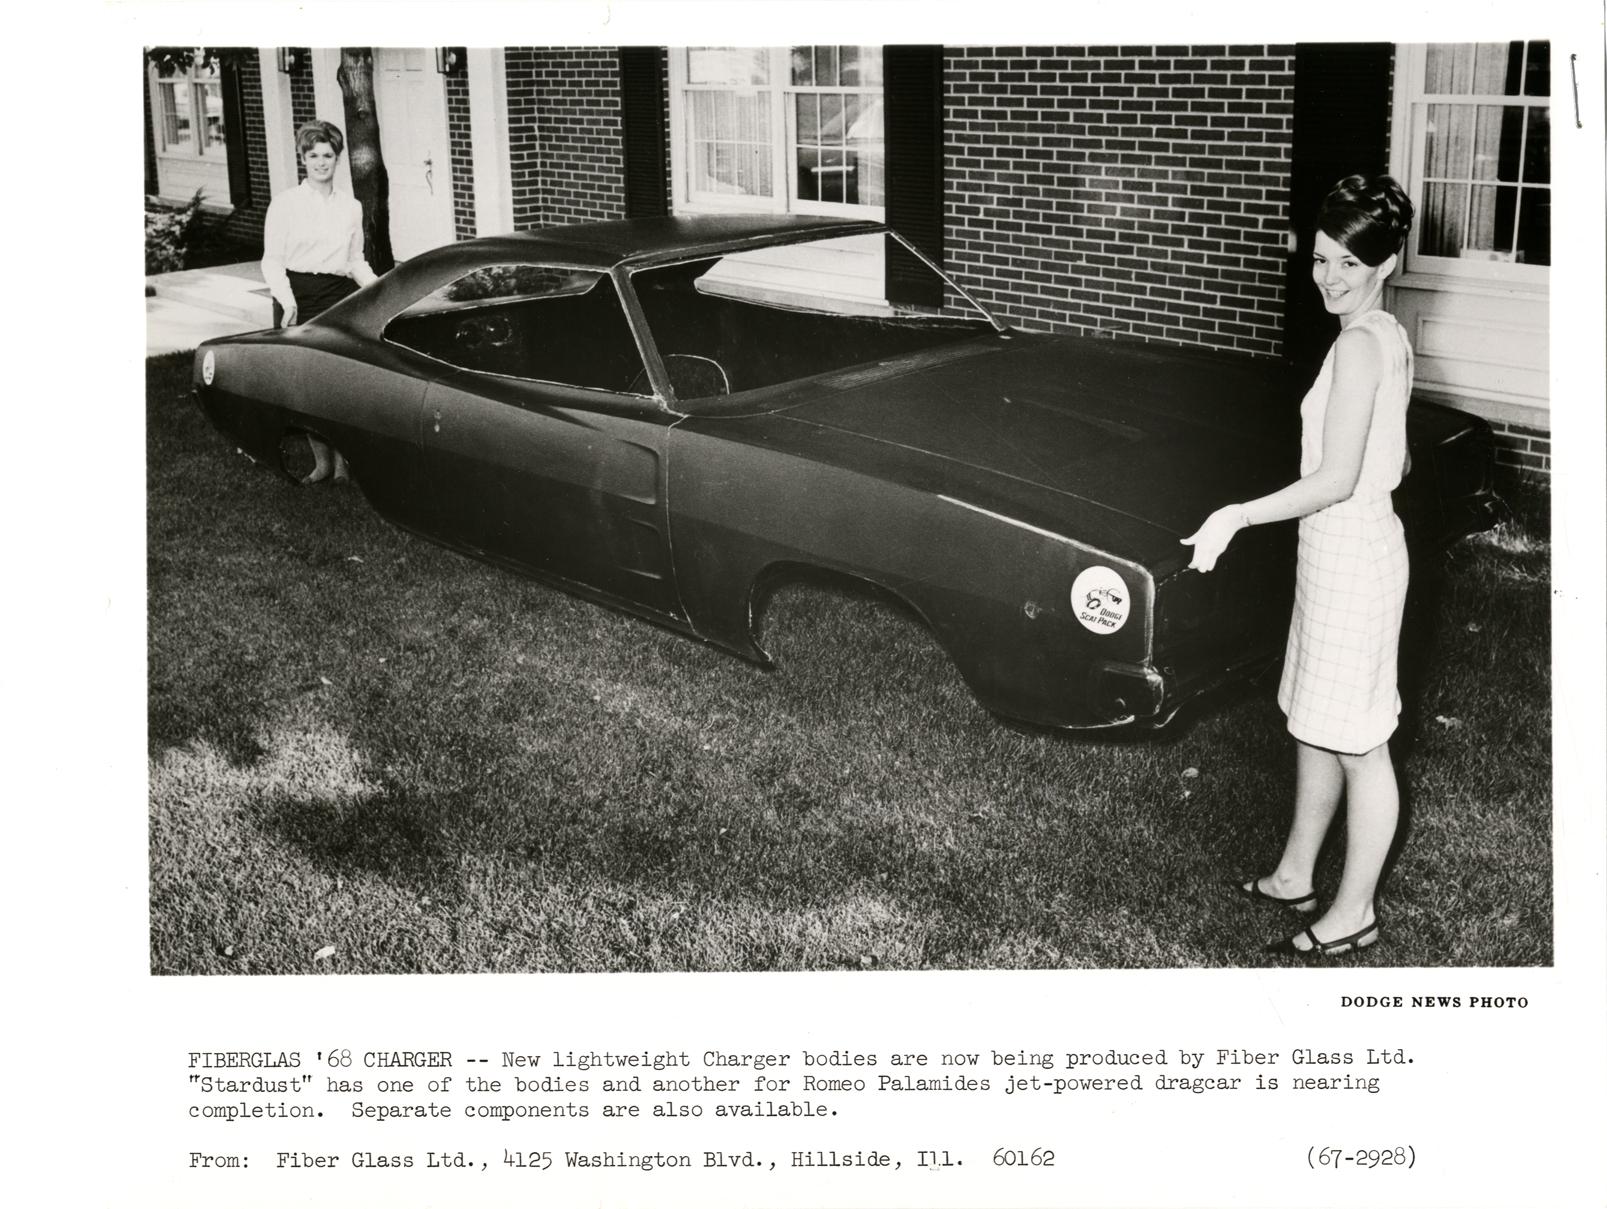 Women Holding A 1968 Dodge Charger Automobile Fiberglass Body Dpl Dams White